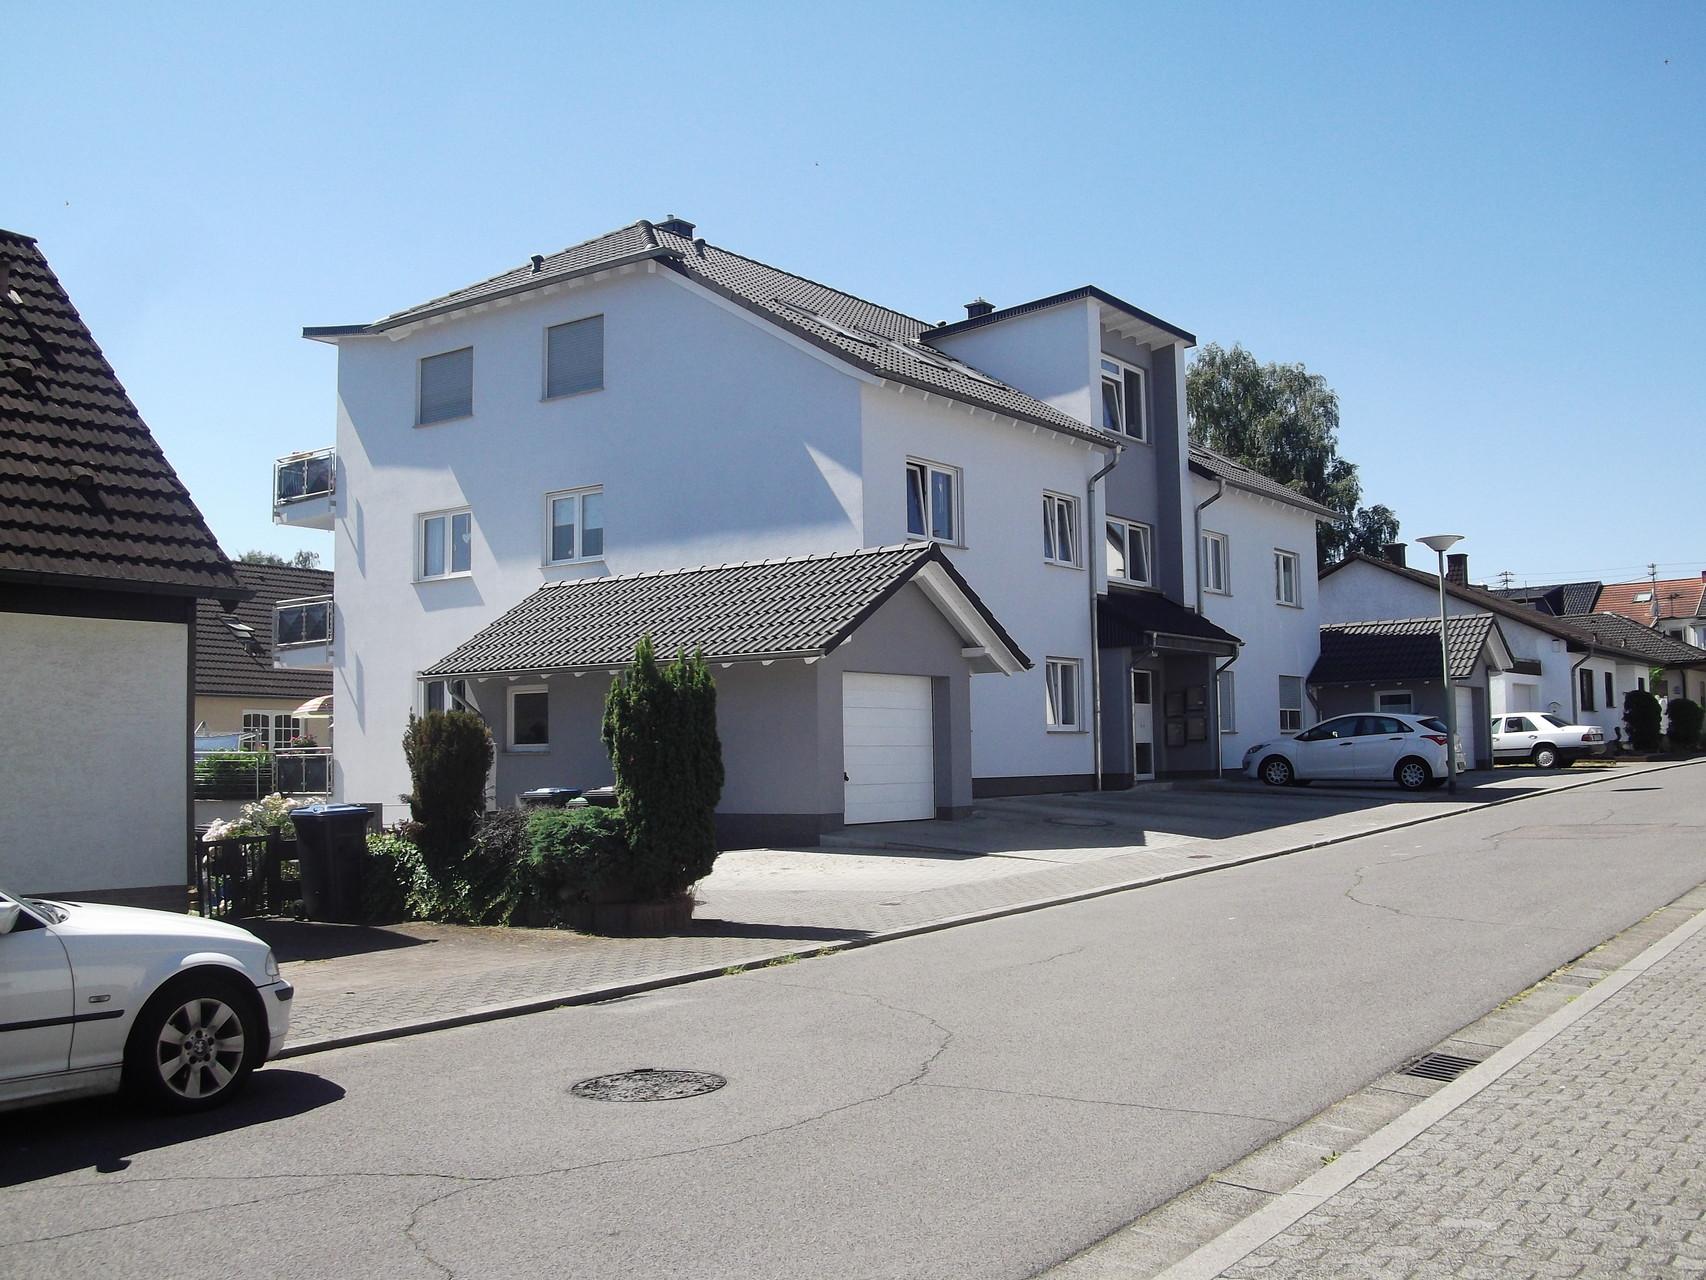 Hostenbach